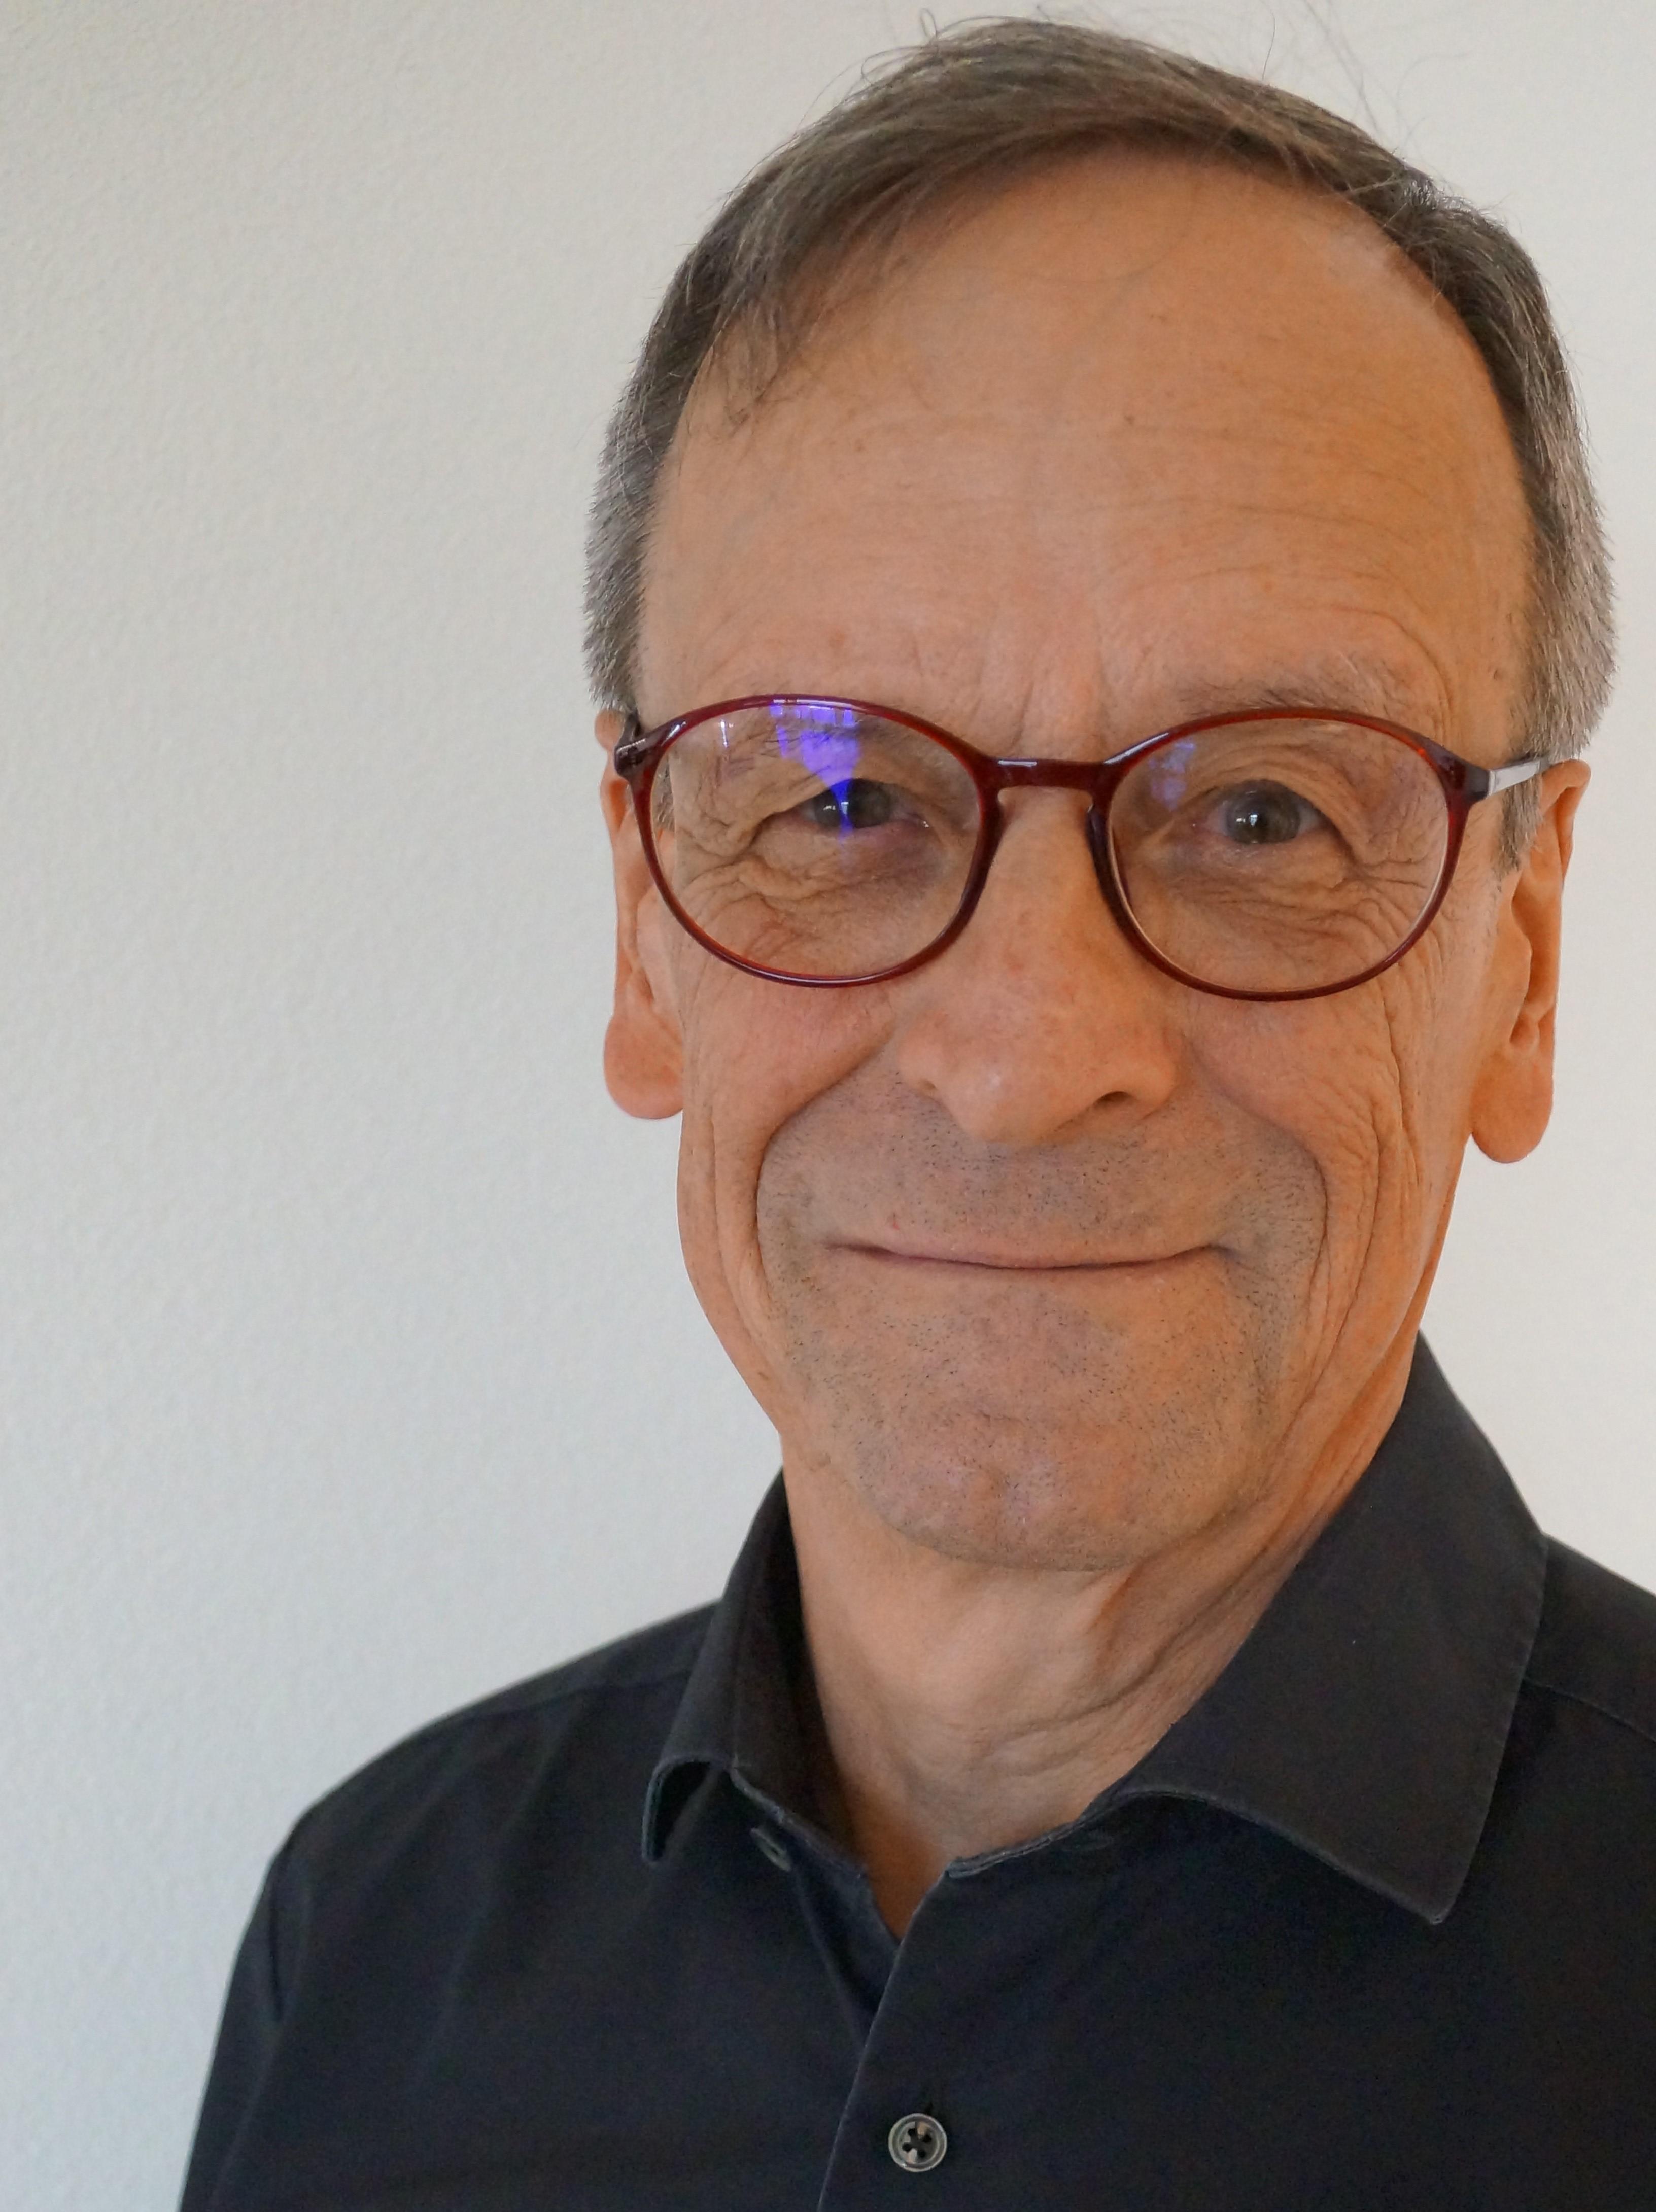 Mathias Ackermann